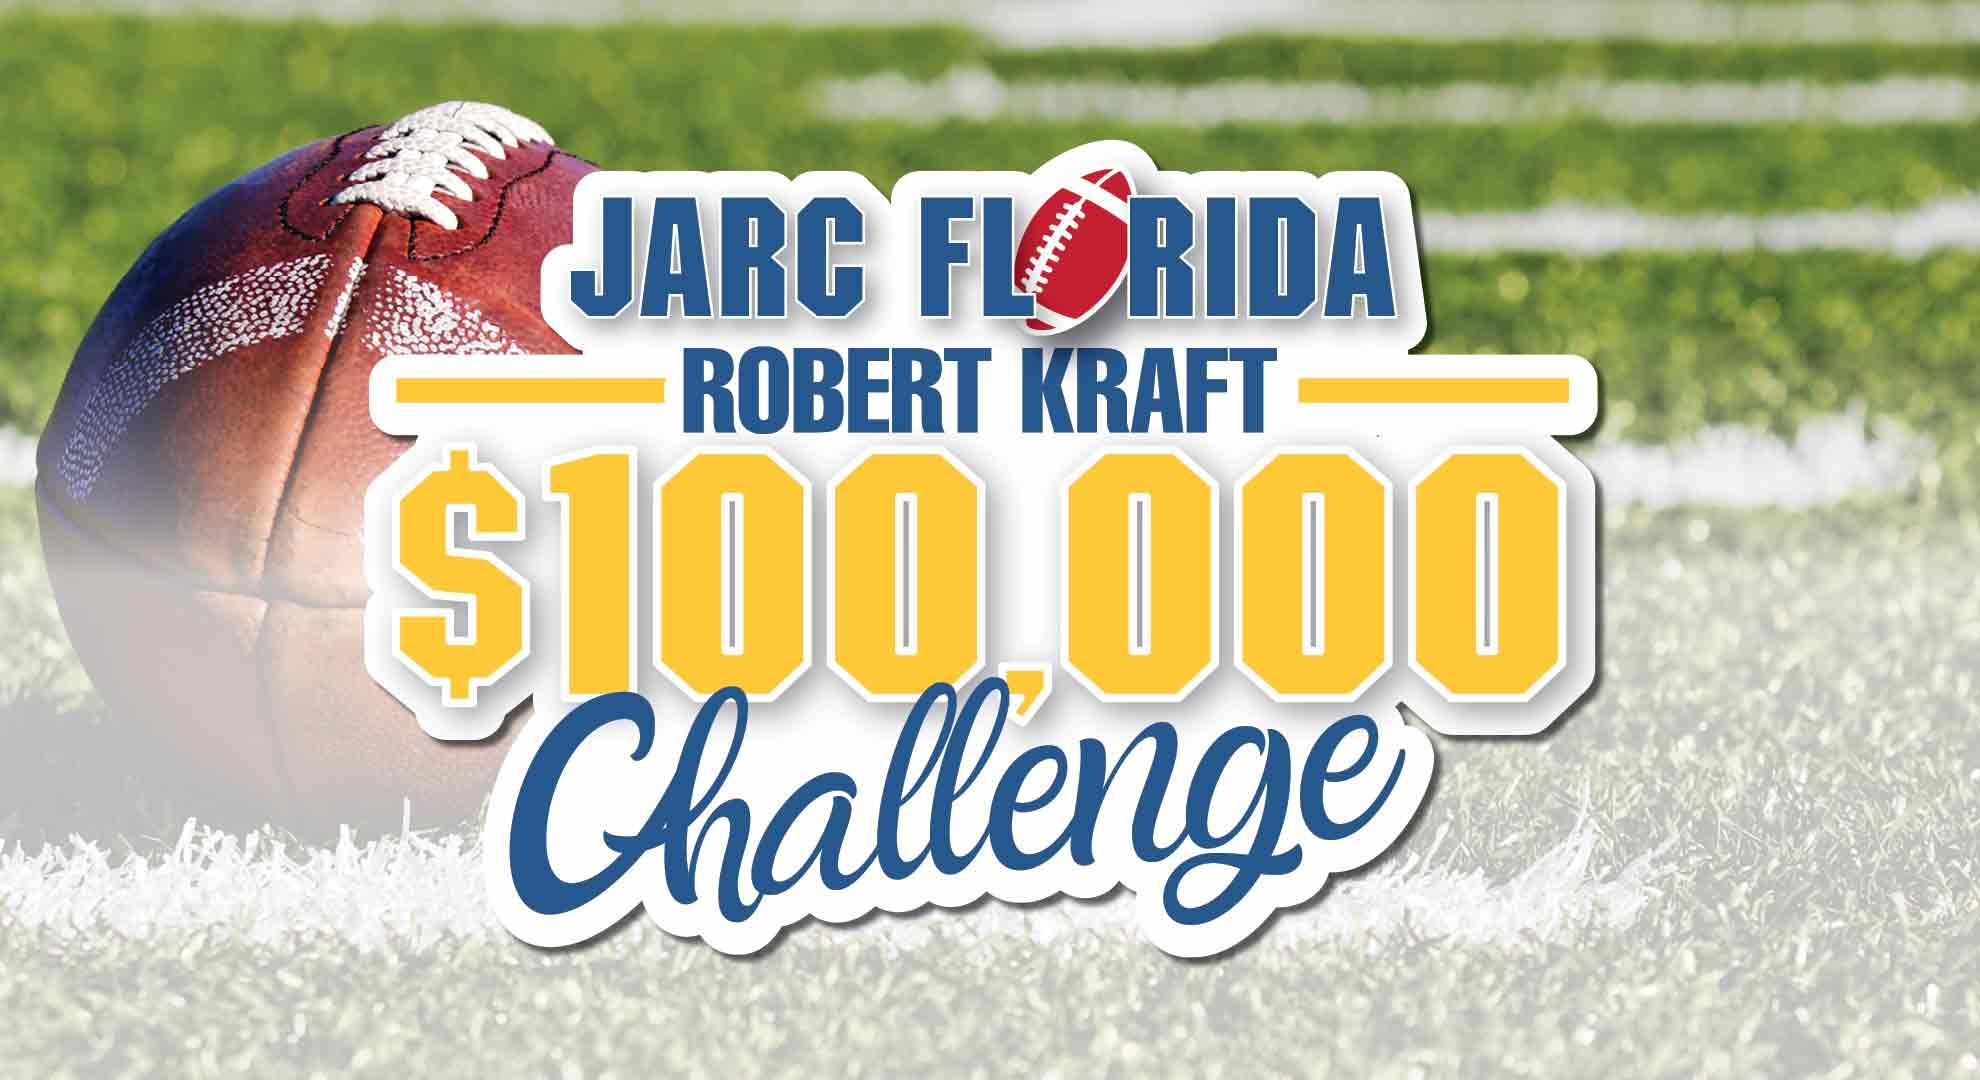 JARC Florida Robert Kraft $100,000 Challenge